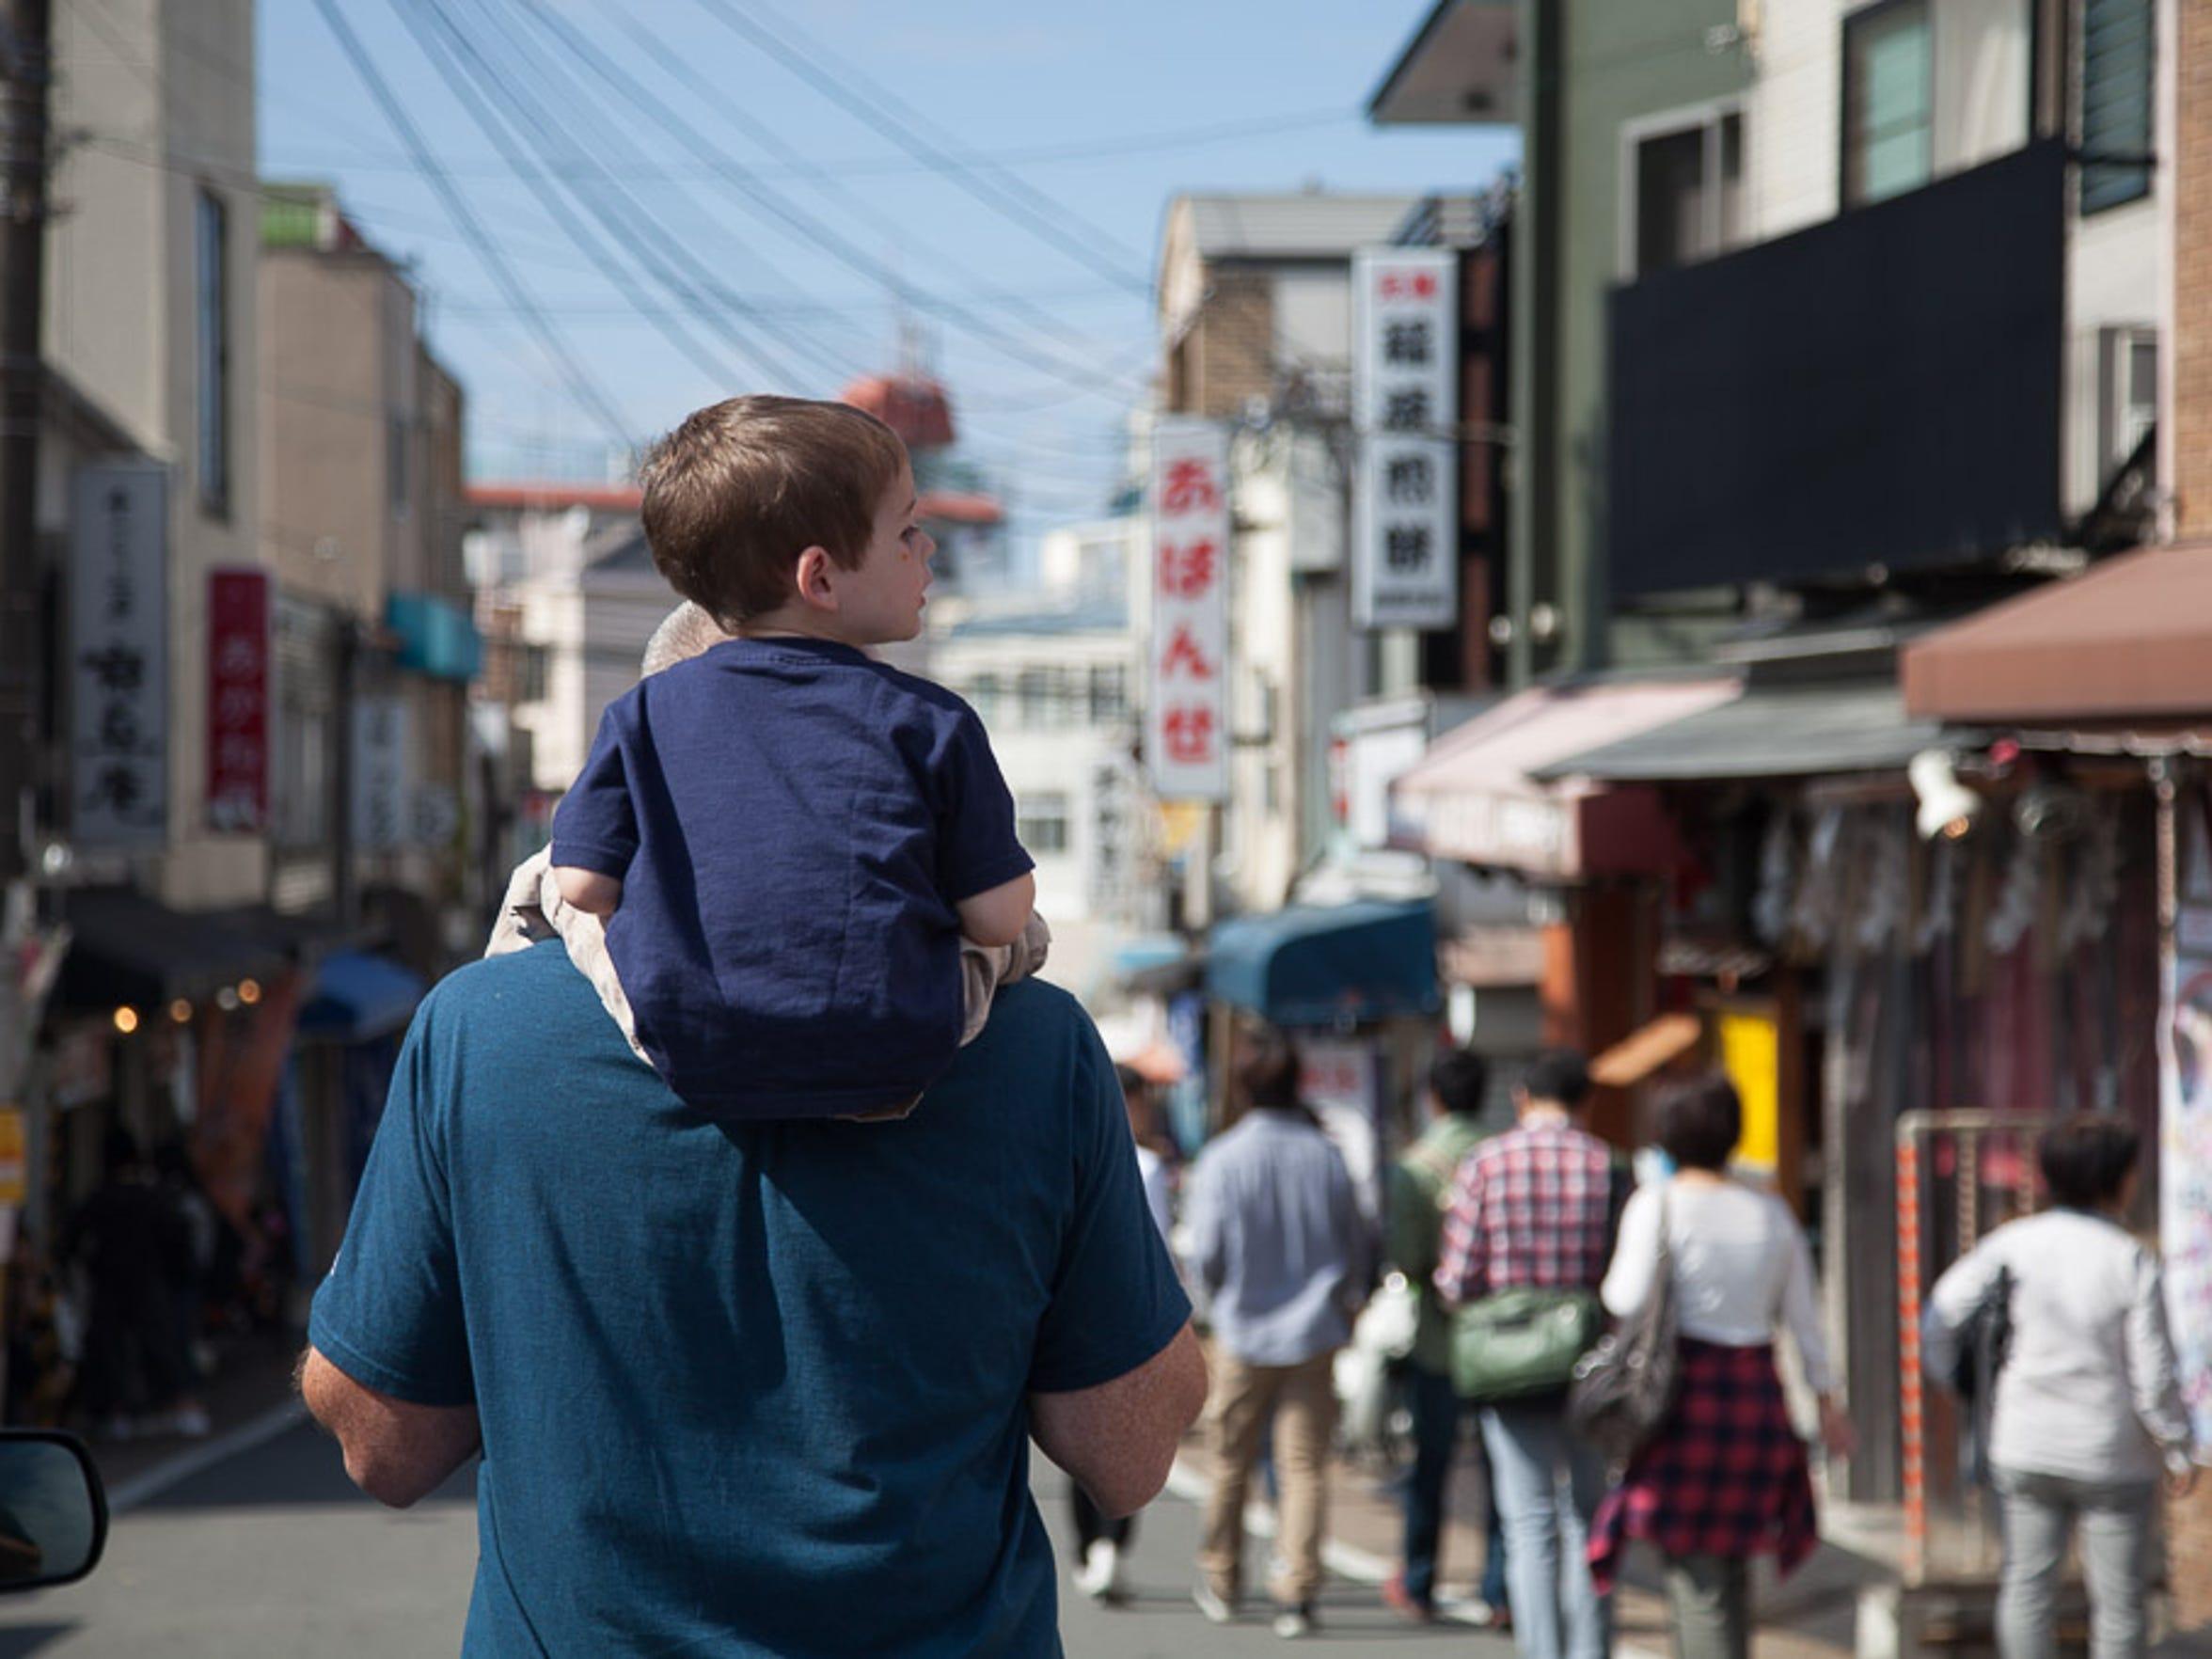 Walker Hughey explores the streets of Kyoto on Derek